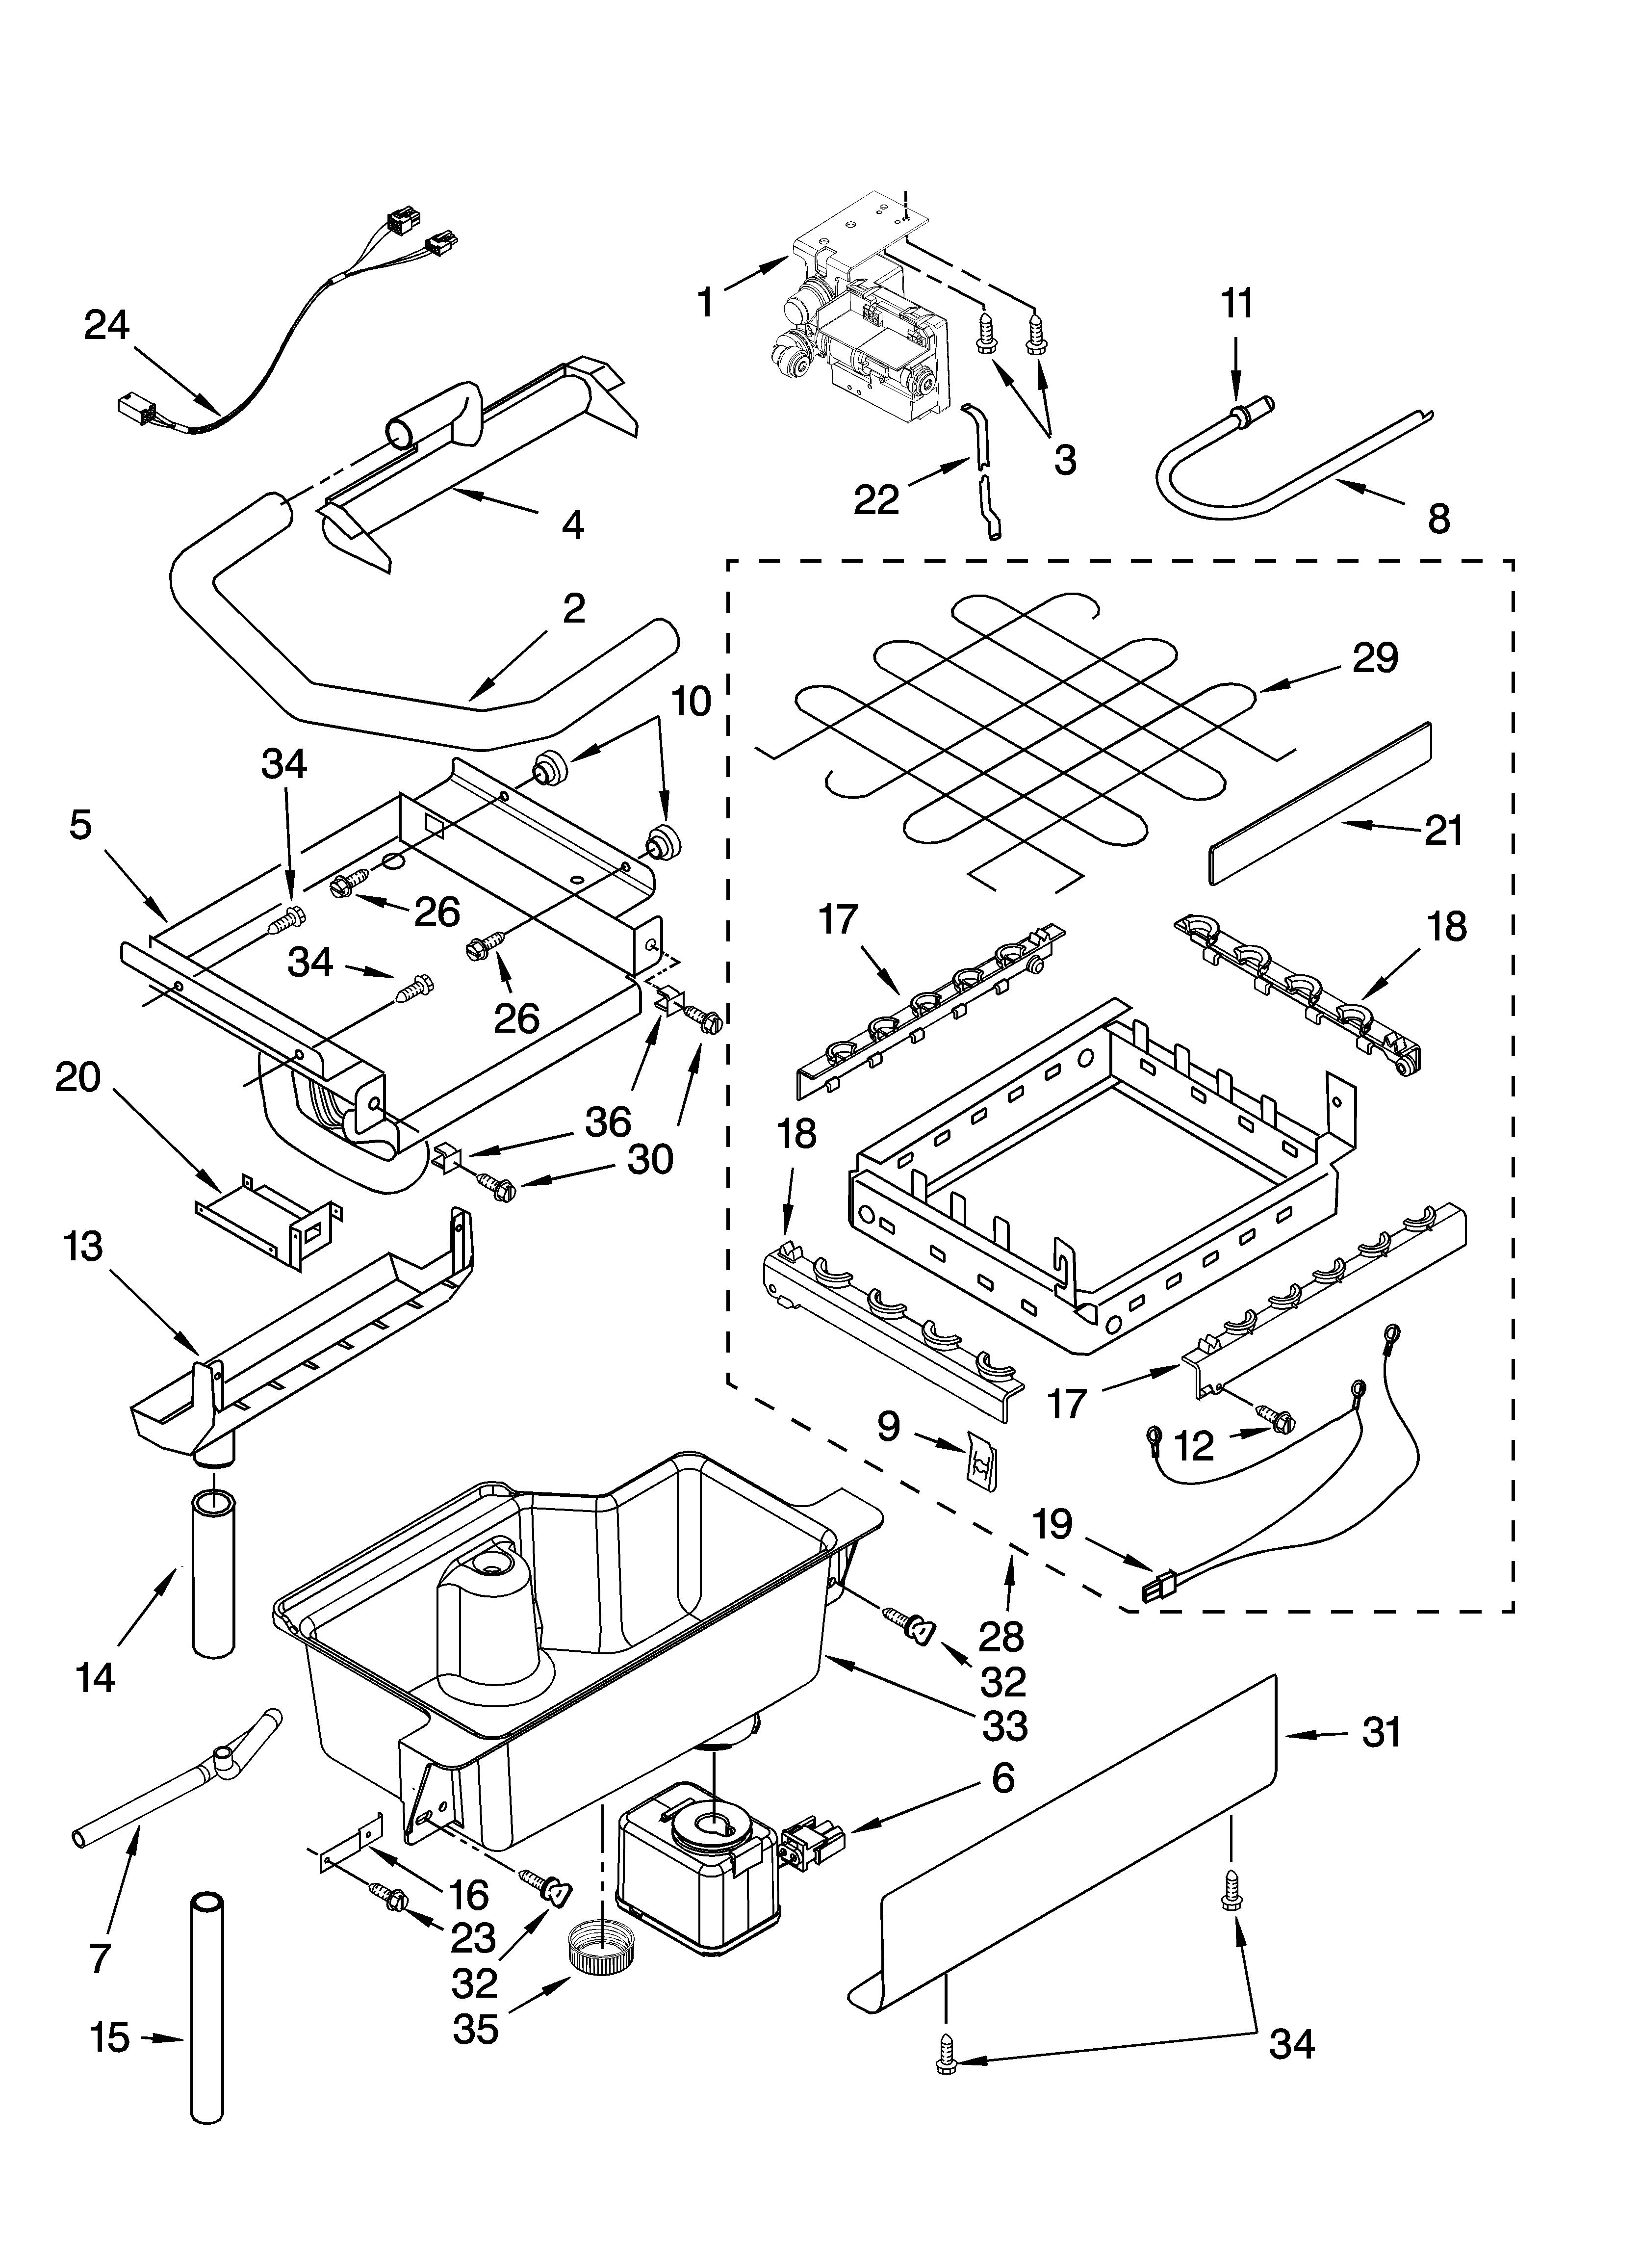 Wiring Diagram For Kitchenaid Ice Maker